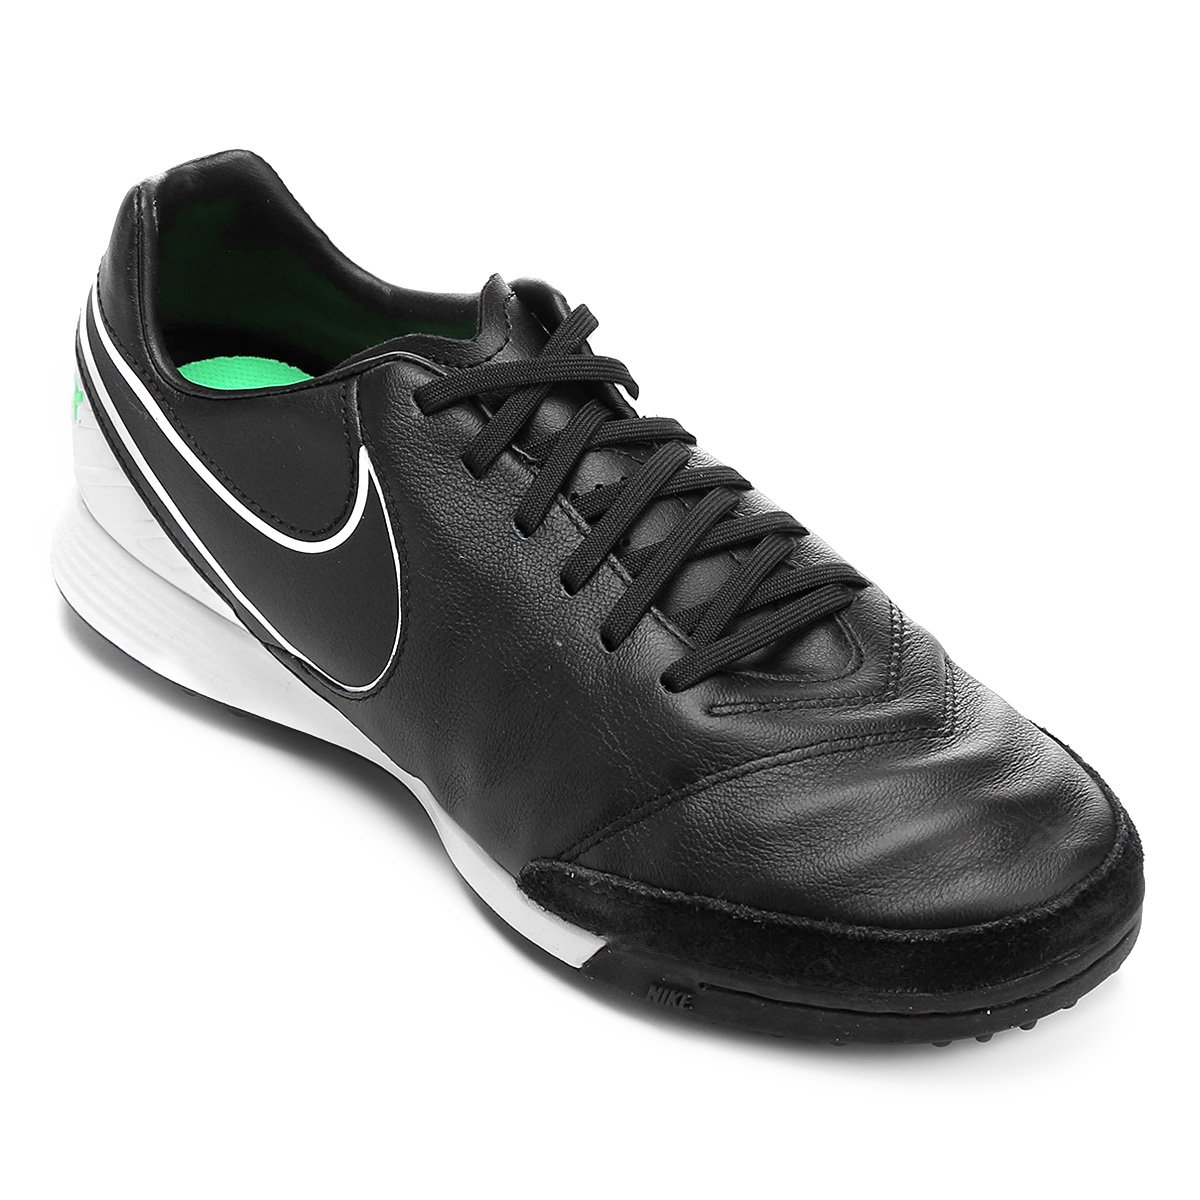 cd846514cc Chuteira Society Nike Tiempo Mystic 5 TF - Preto e verde